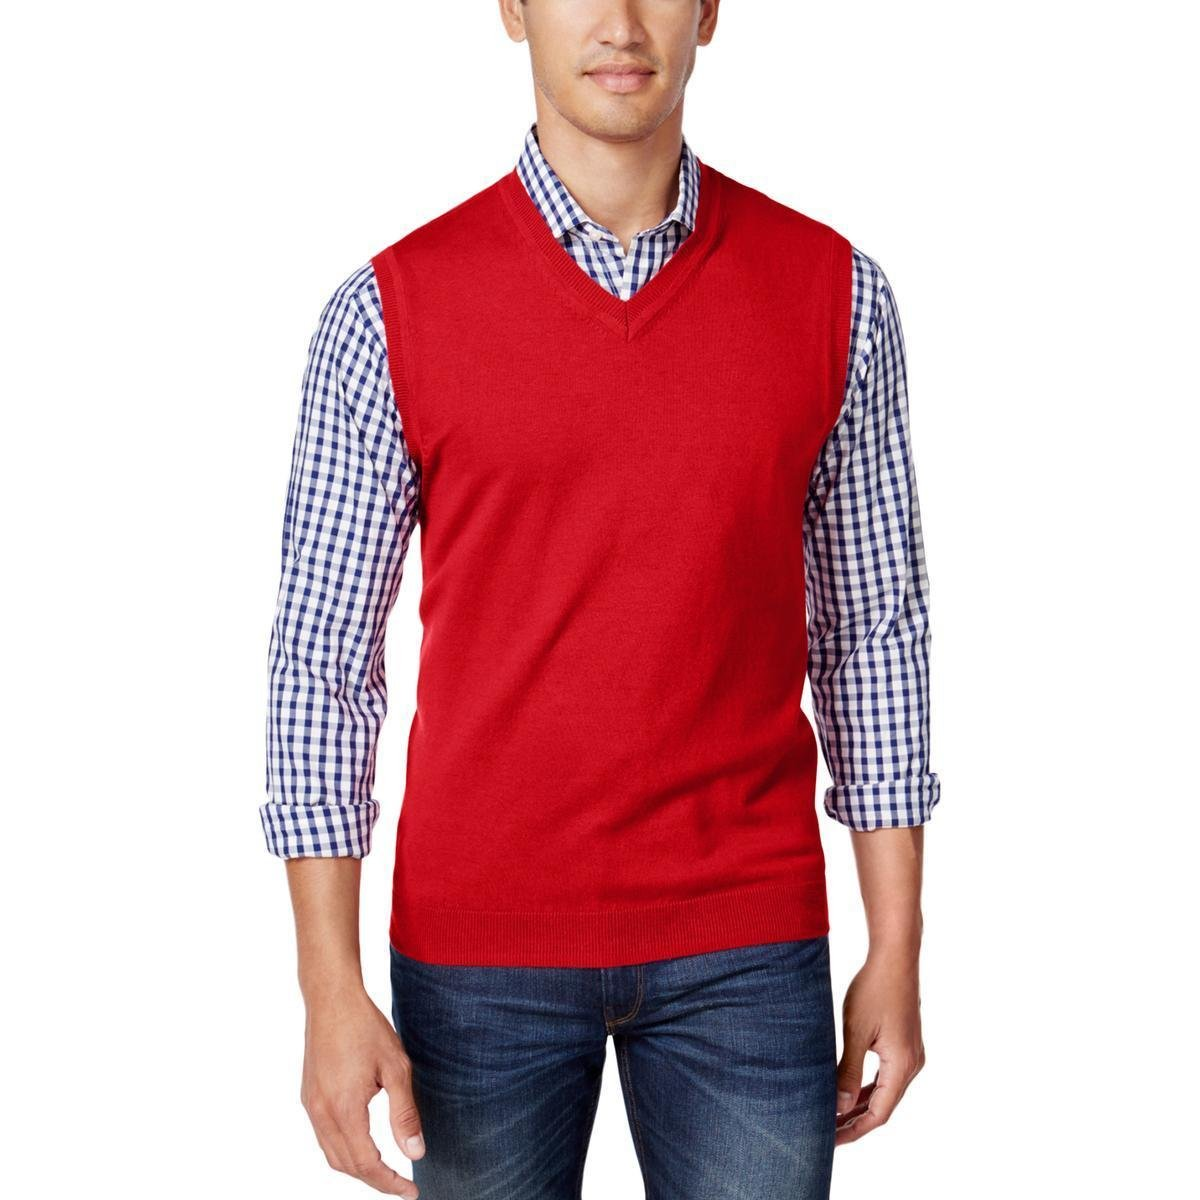 Club Room Mens V-Neck Sweater Vest